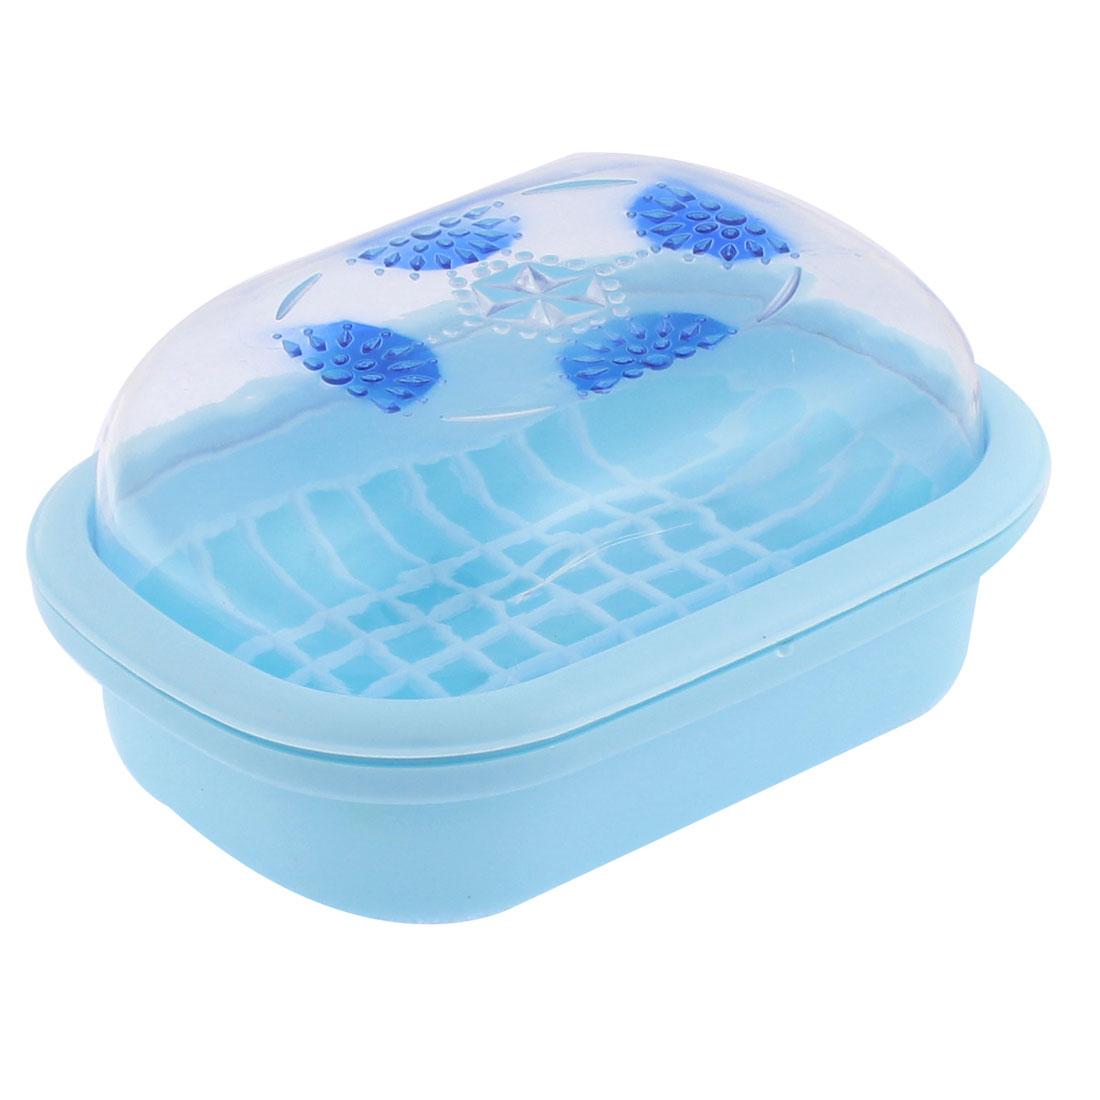 Home Bathroom Soap Dish Case Holder Box Sky Blue